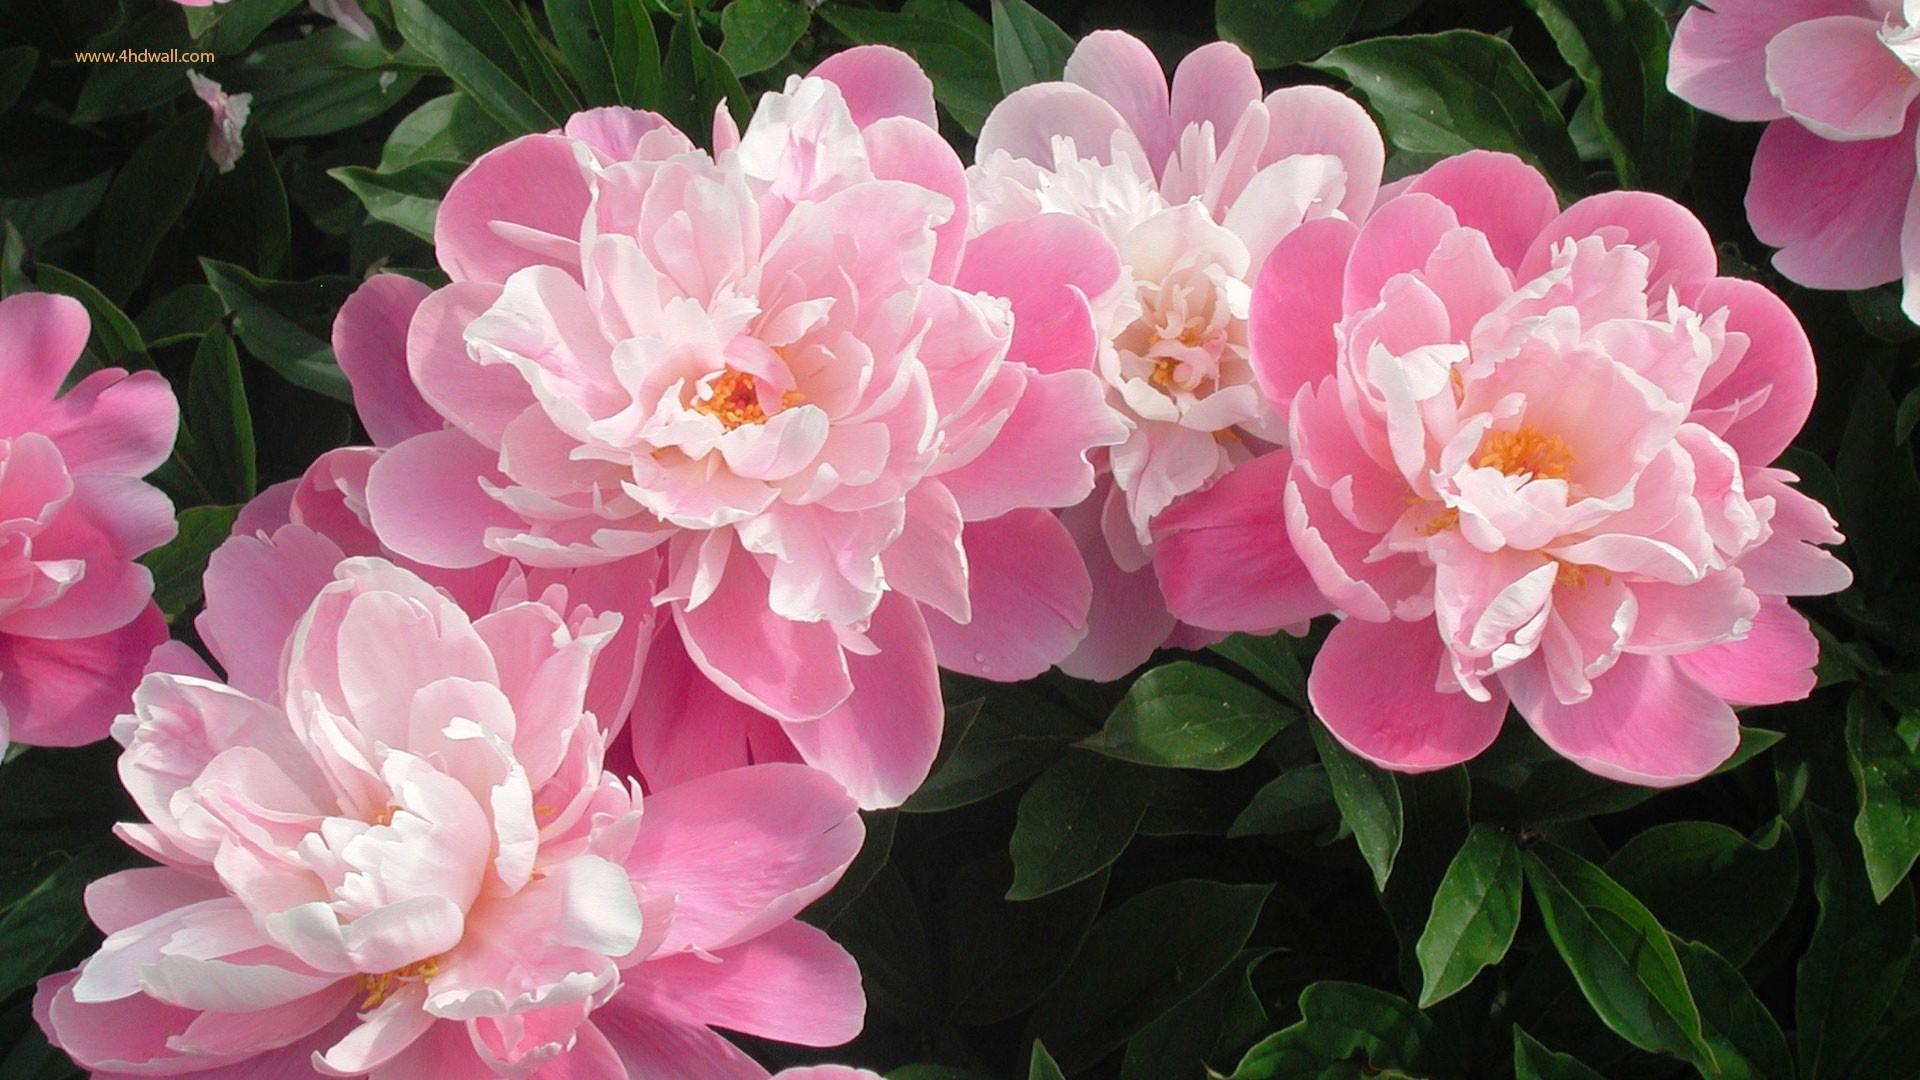 White And Pink Flower Wallpaper Iphone : Flower Wallpaper – Kokean.com